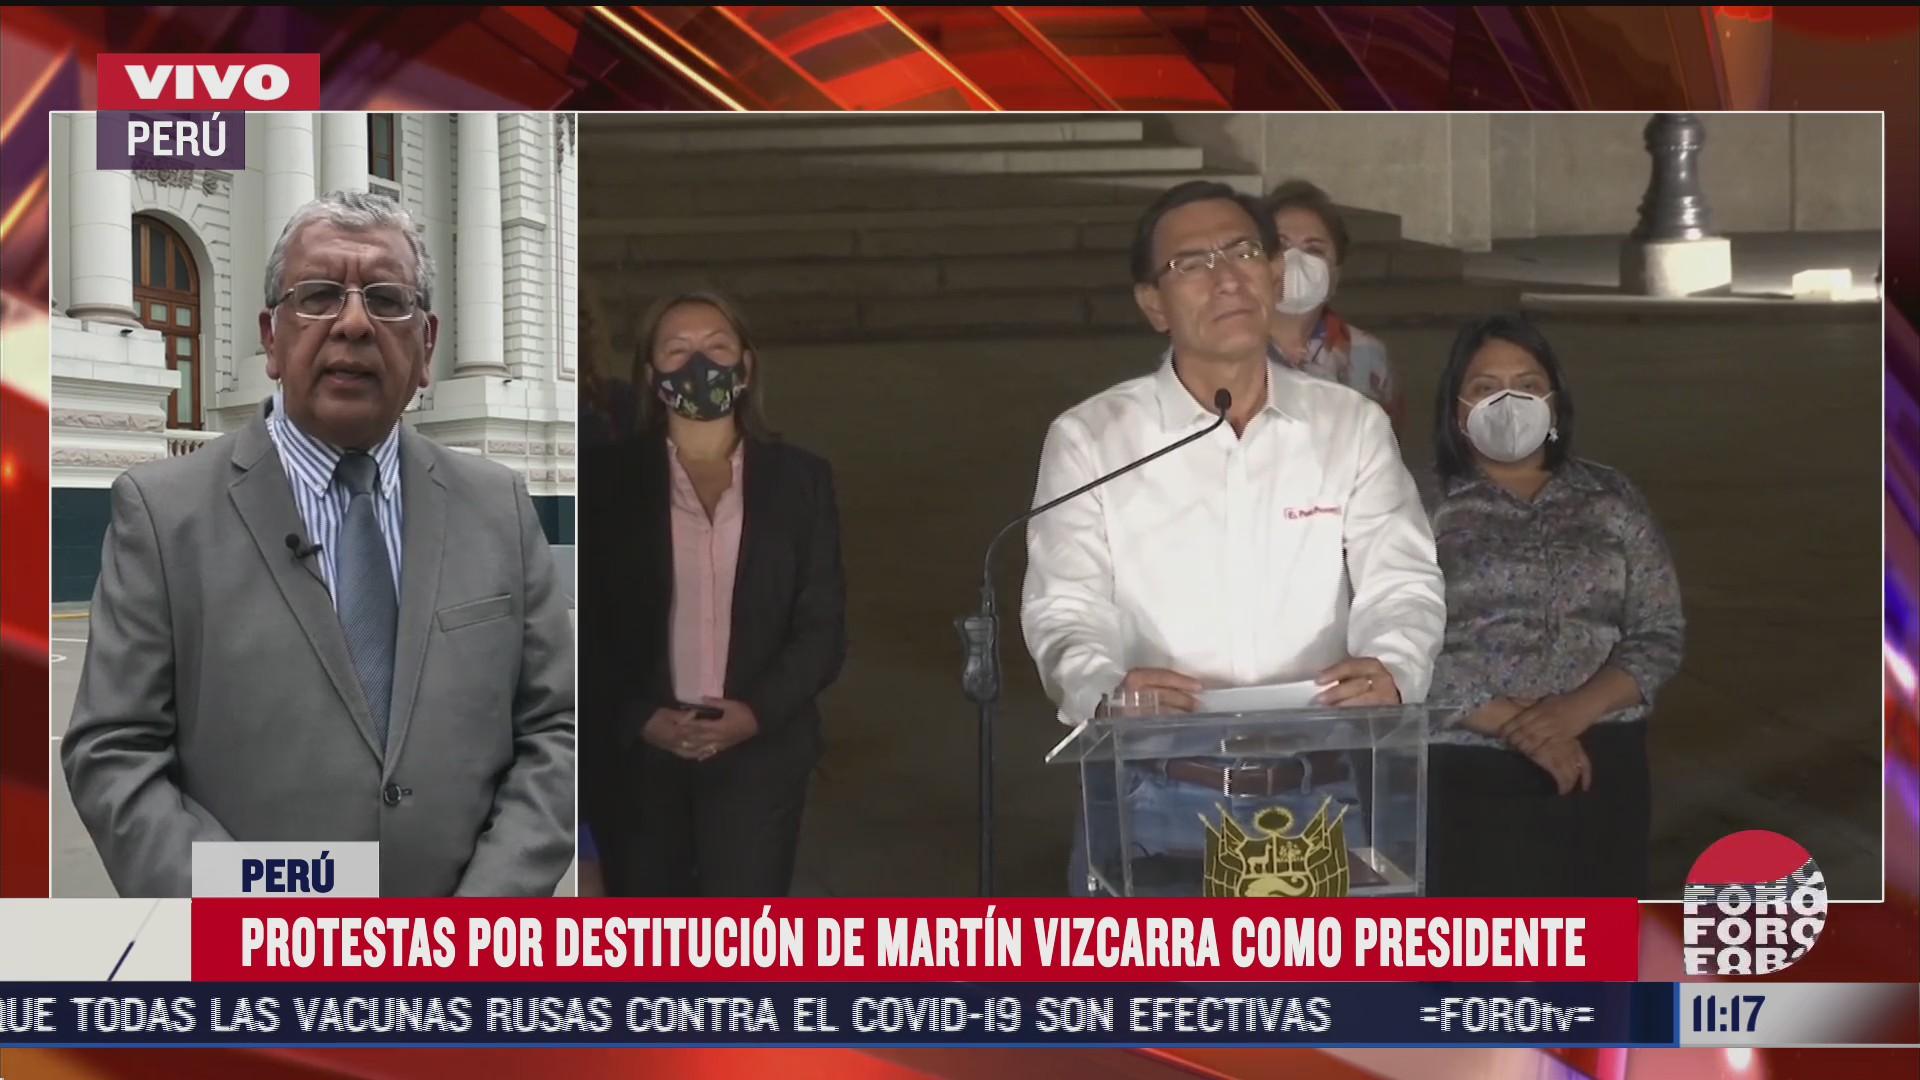 destitucion del presidente de peru desata protestas